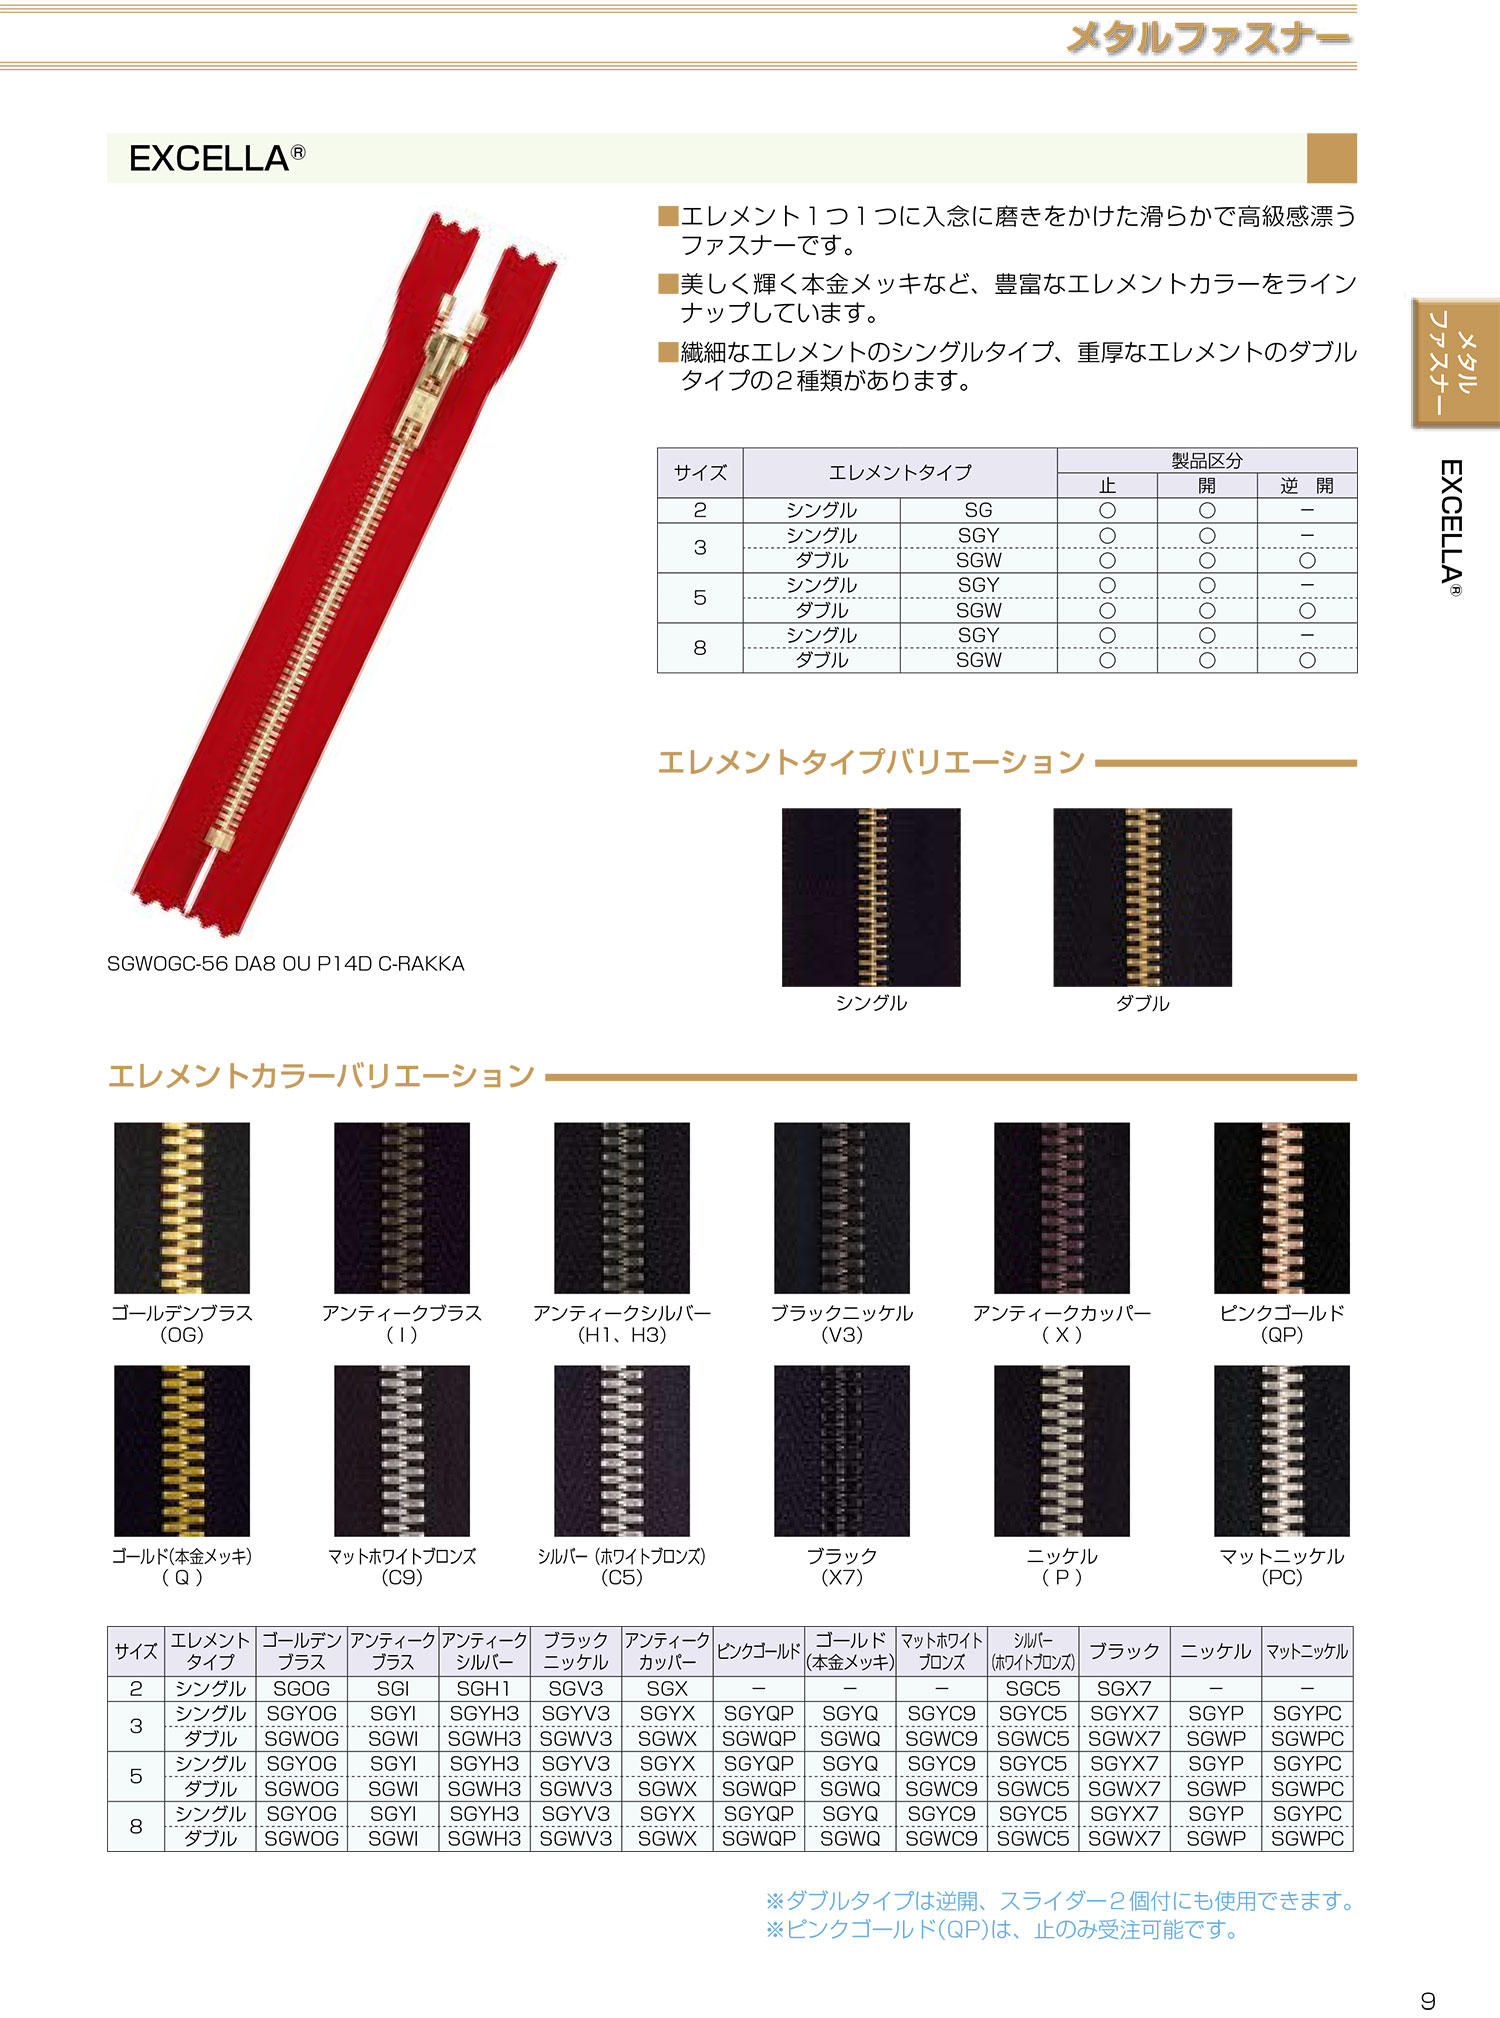 8SGWPCMR エクセラ 8サイズ マットニッケル 逆開 ダブル[ファスナー] YKK/オークラ商事 - ApparelX アパレル資材卸通販